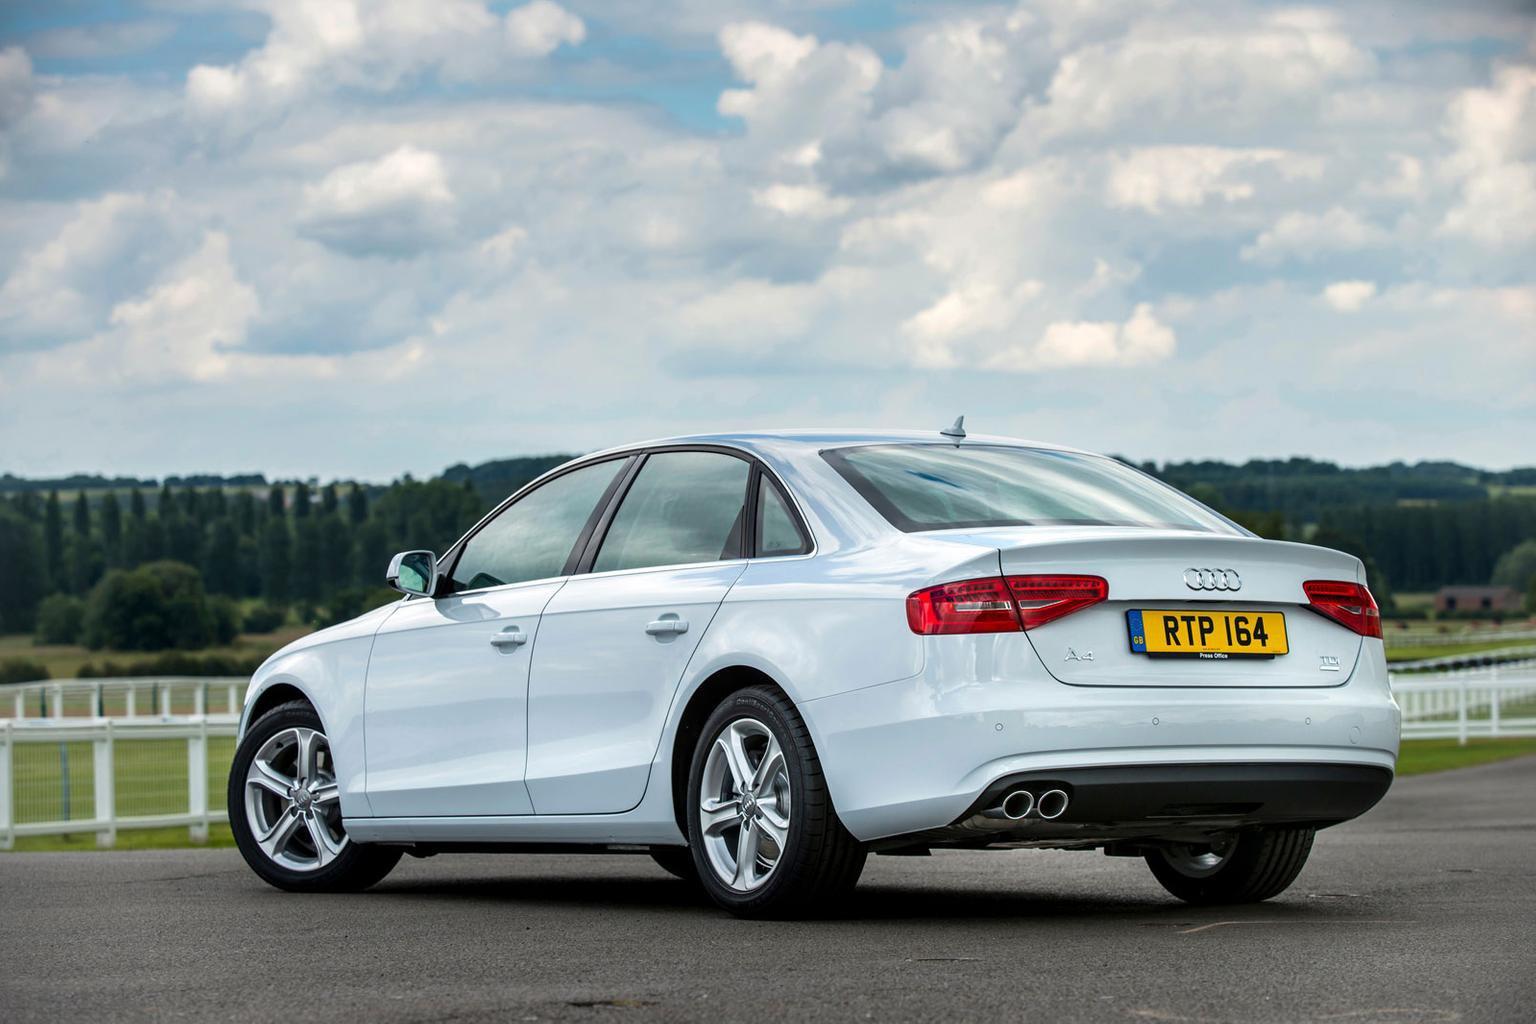 2014 Audi A4 2.0 TDI Ultra review